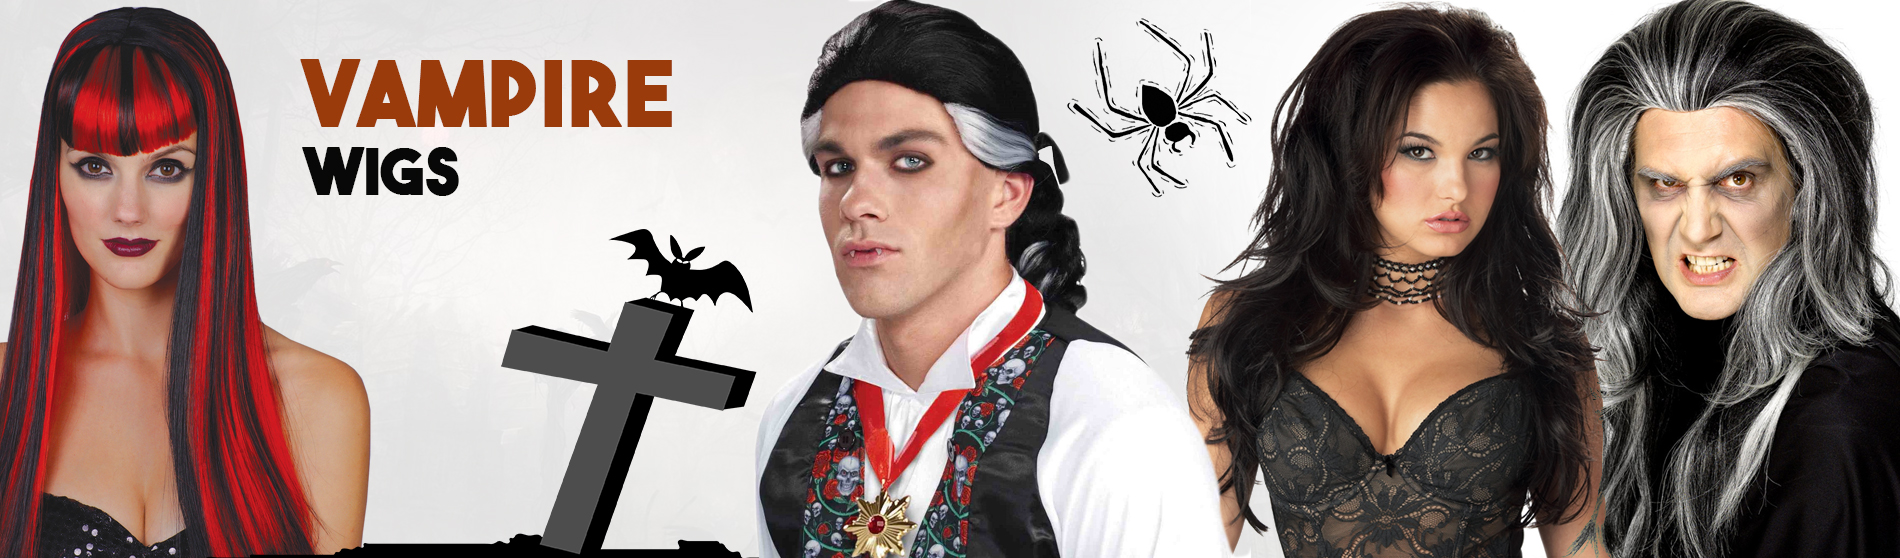 vampire-wigs